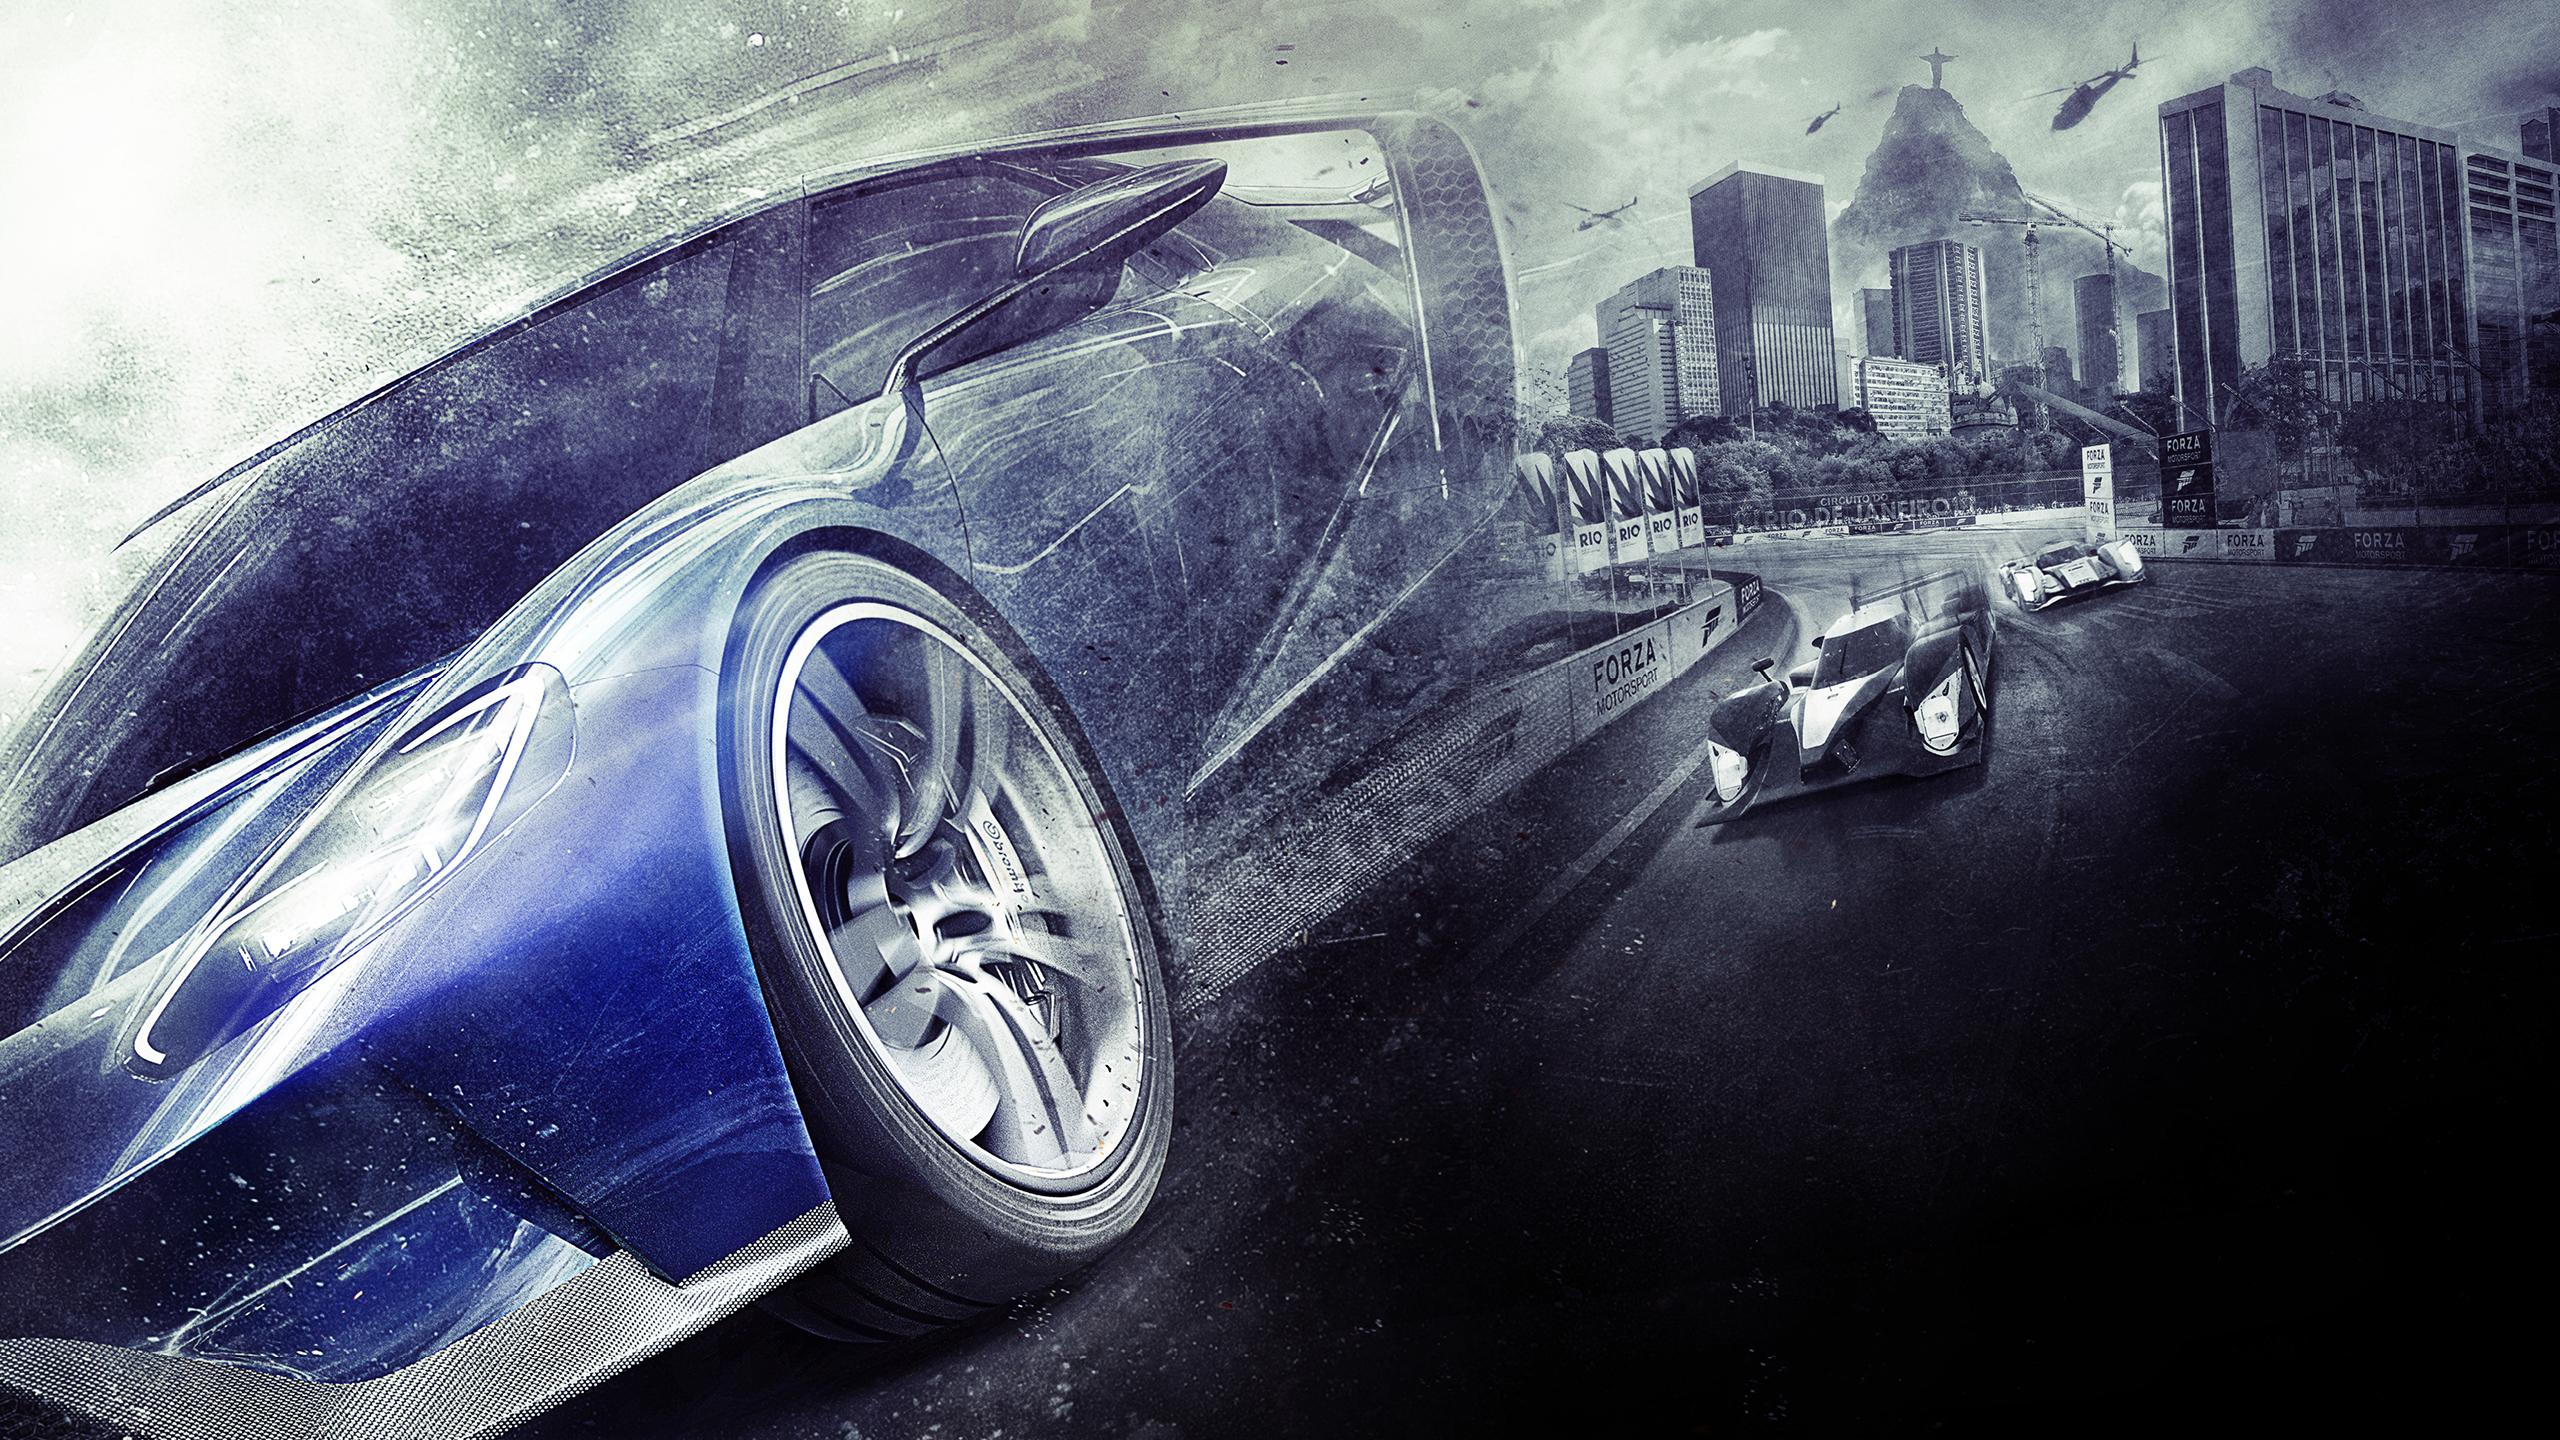 Forza Motorsport 6 Wallpapers HD Wallpapers 2560x1440